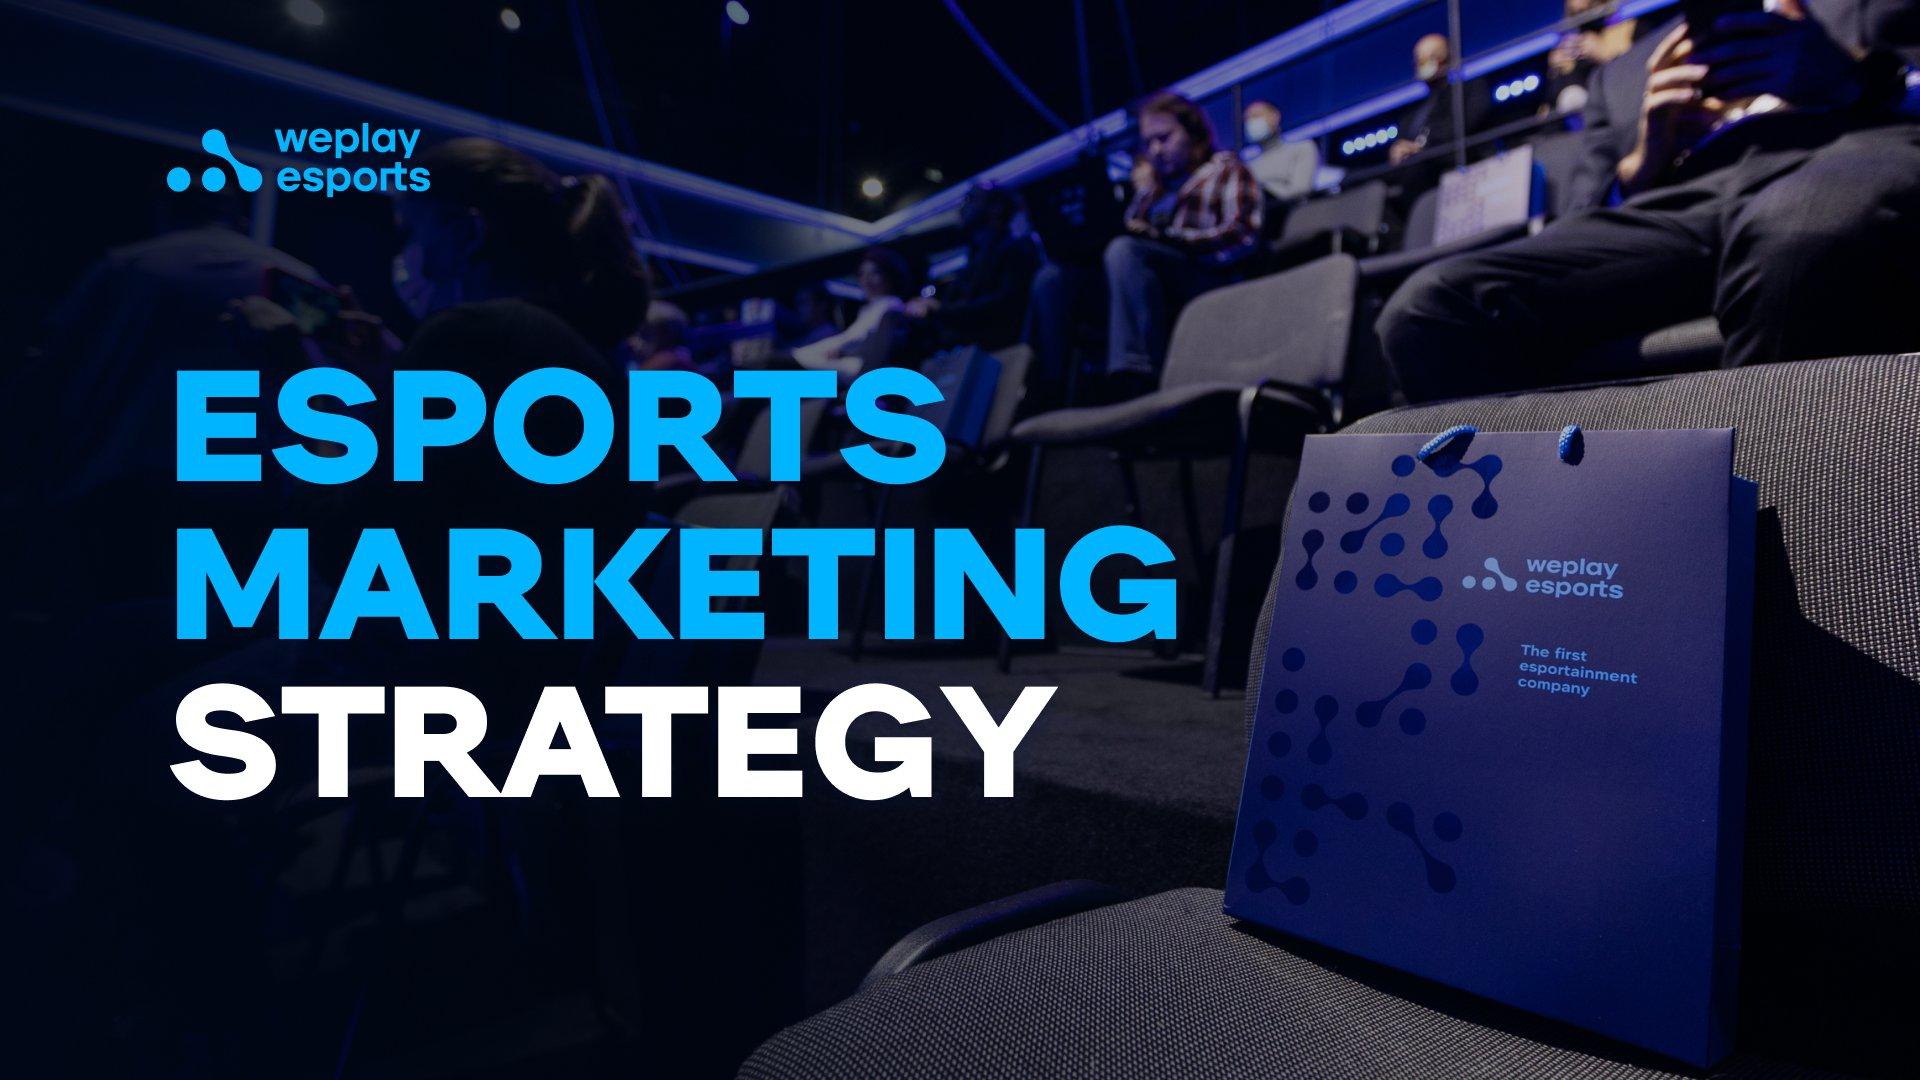 Esports Marketing Strategy